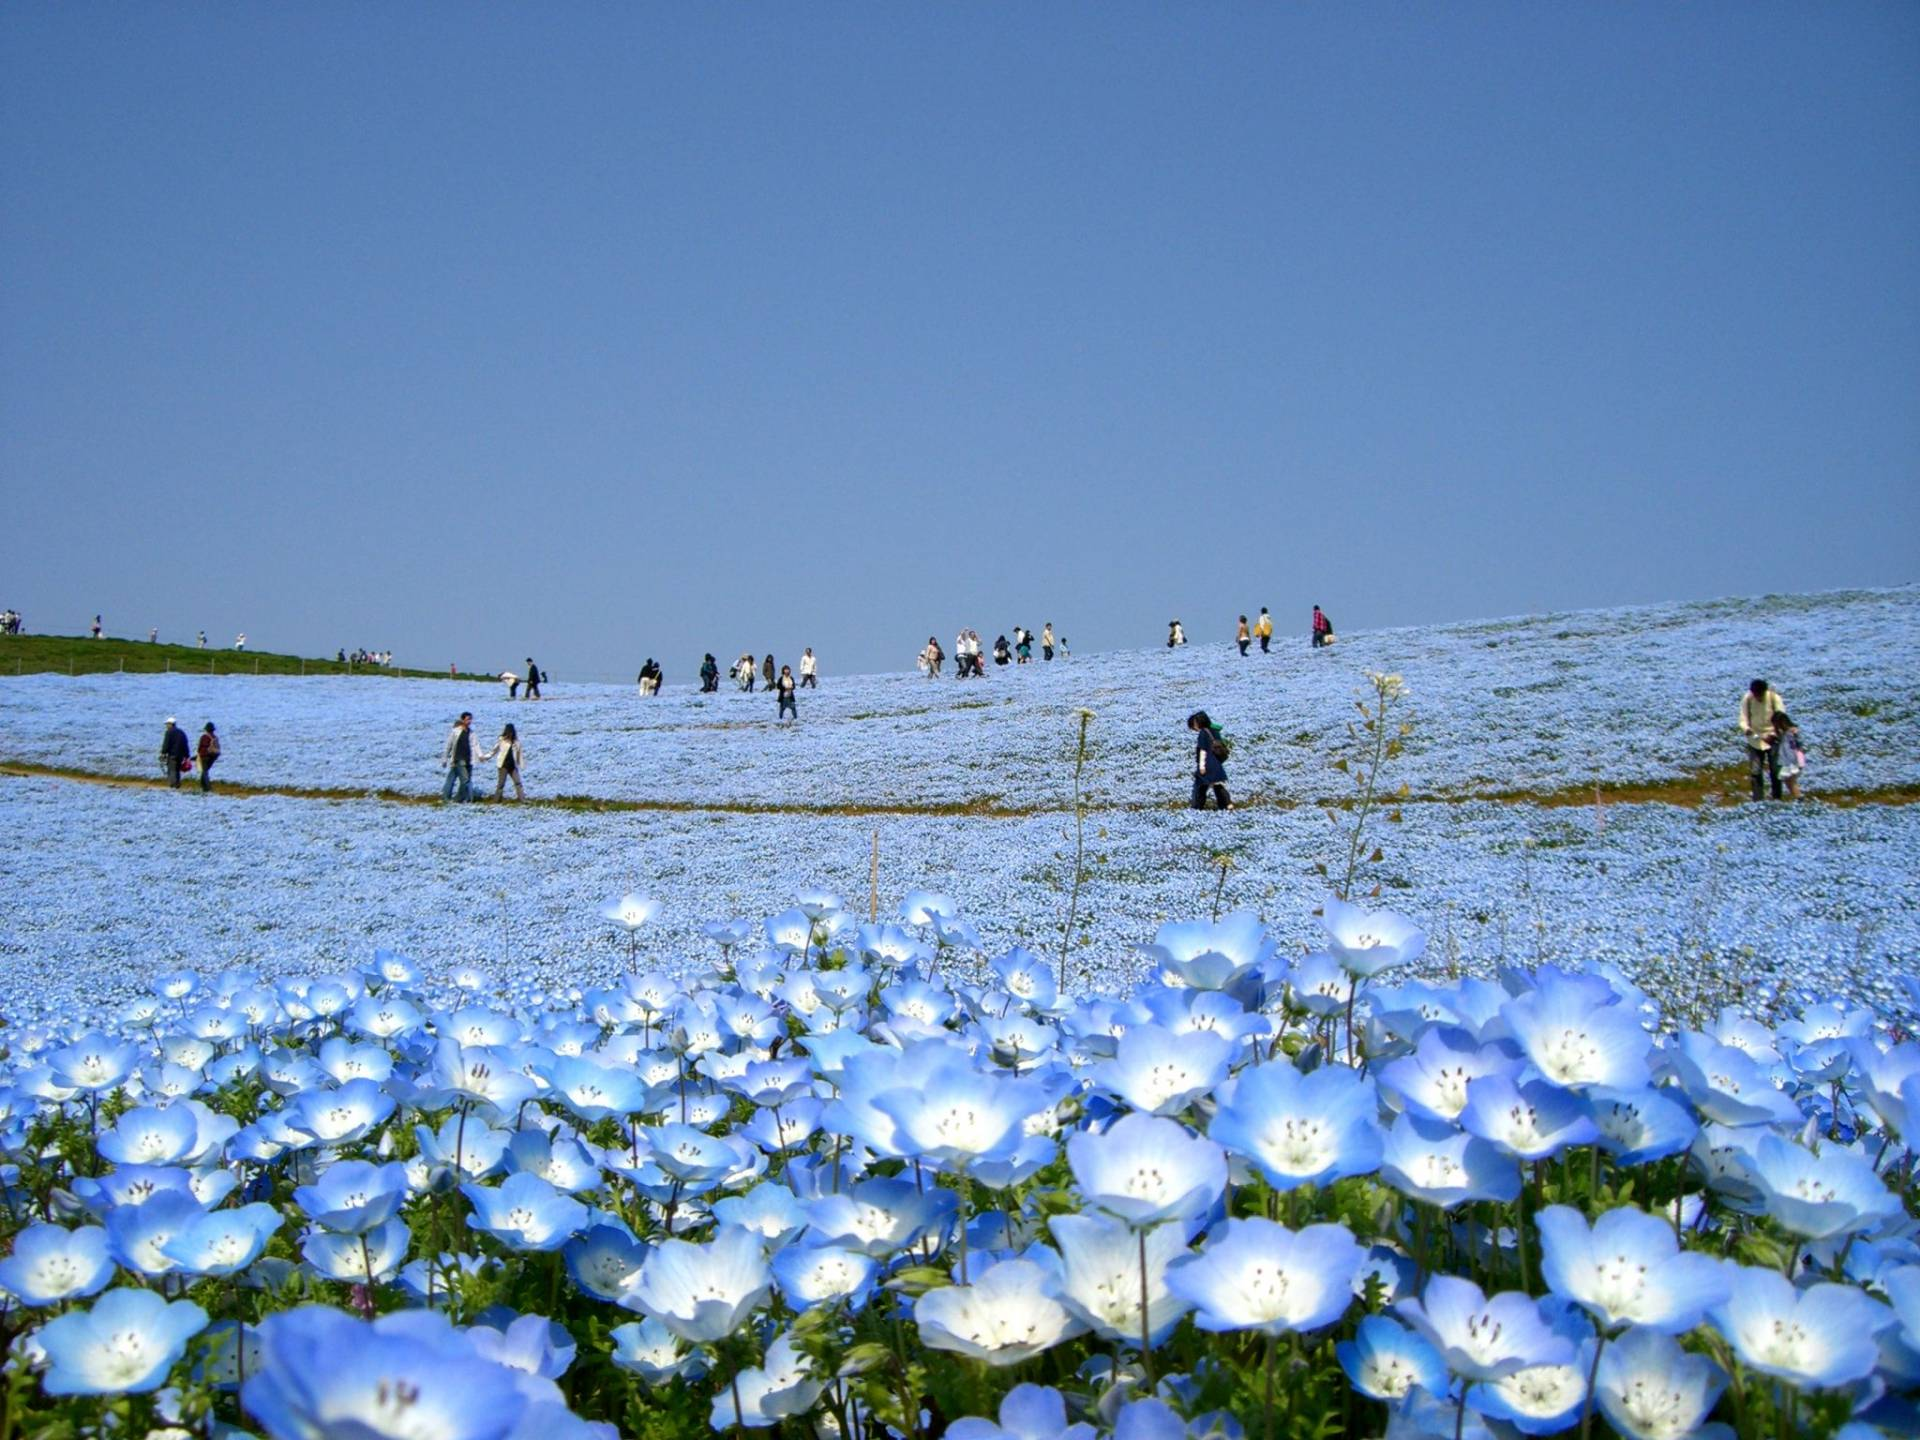 Hitachi Seaside Park: a blue flower carpet